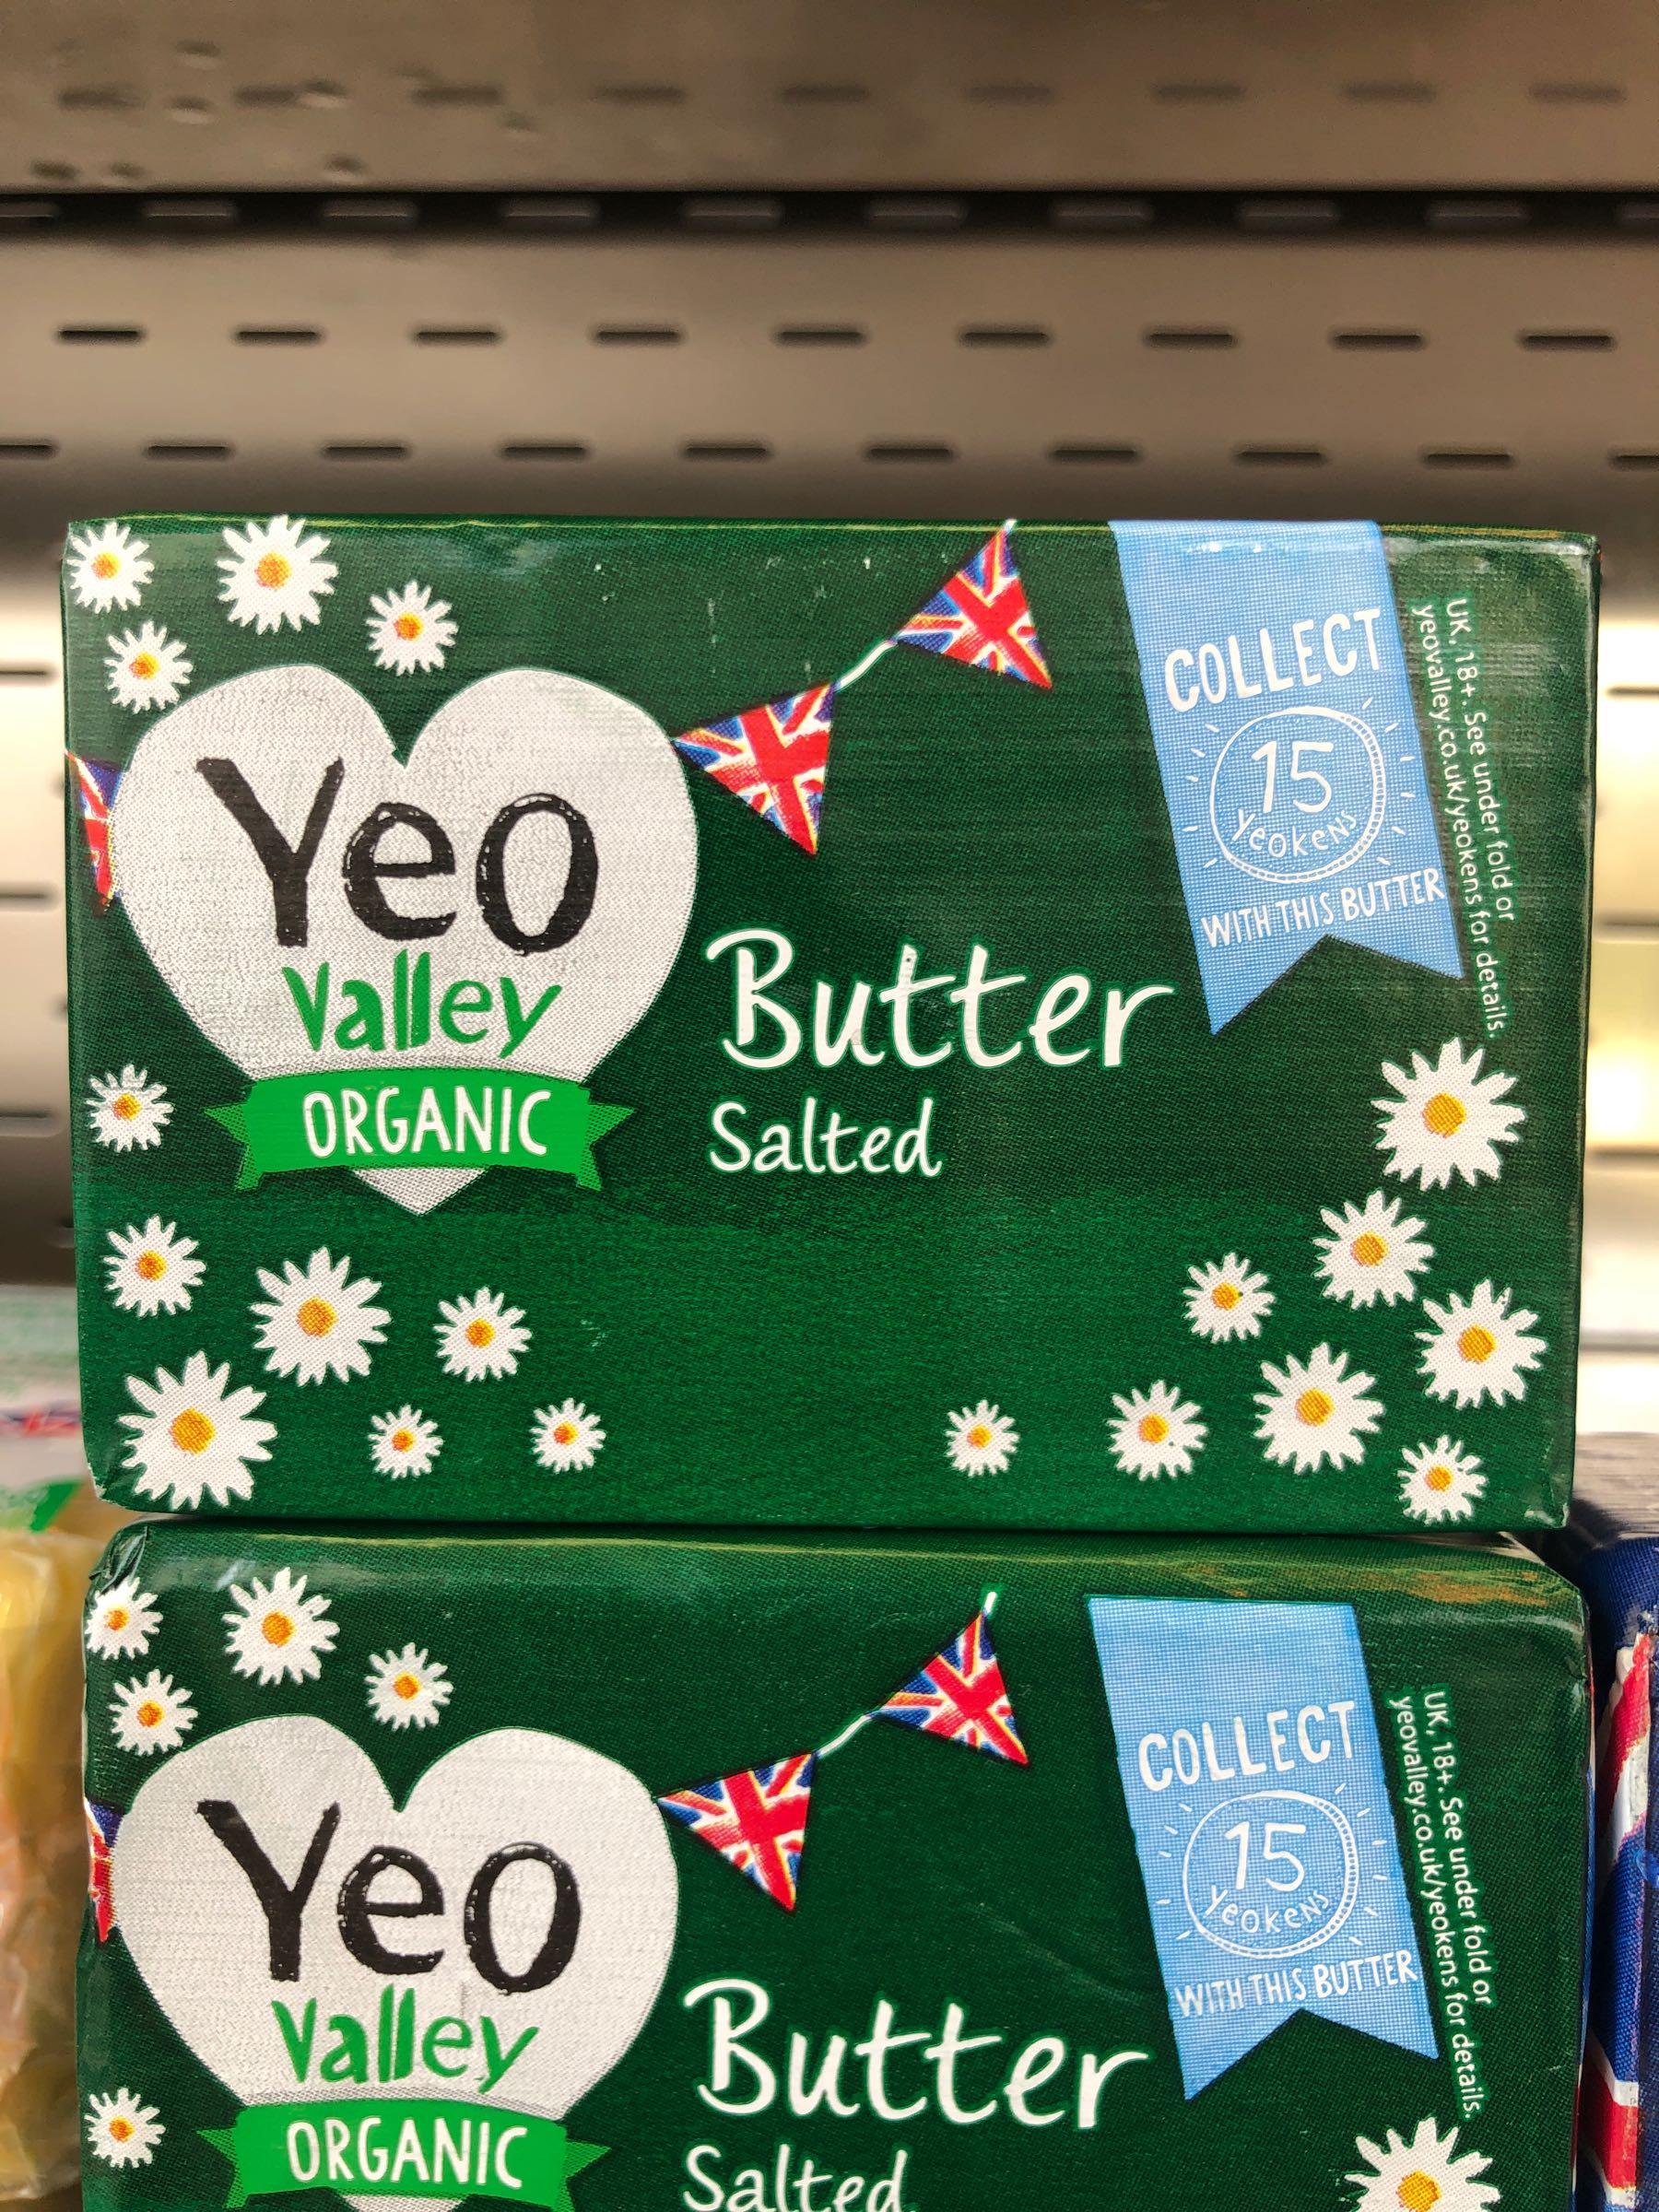 Yep Valley Organic Butter